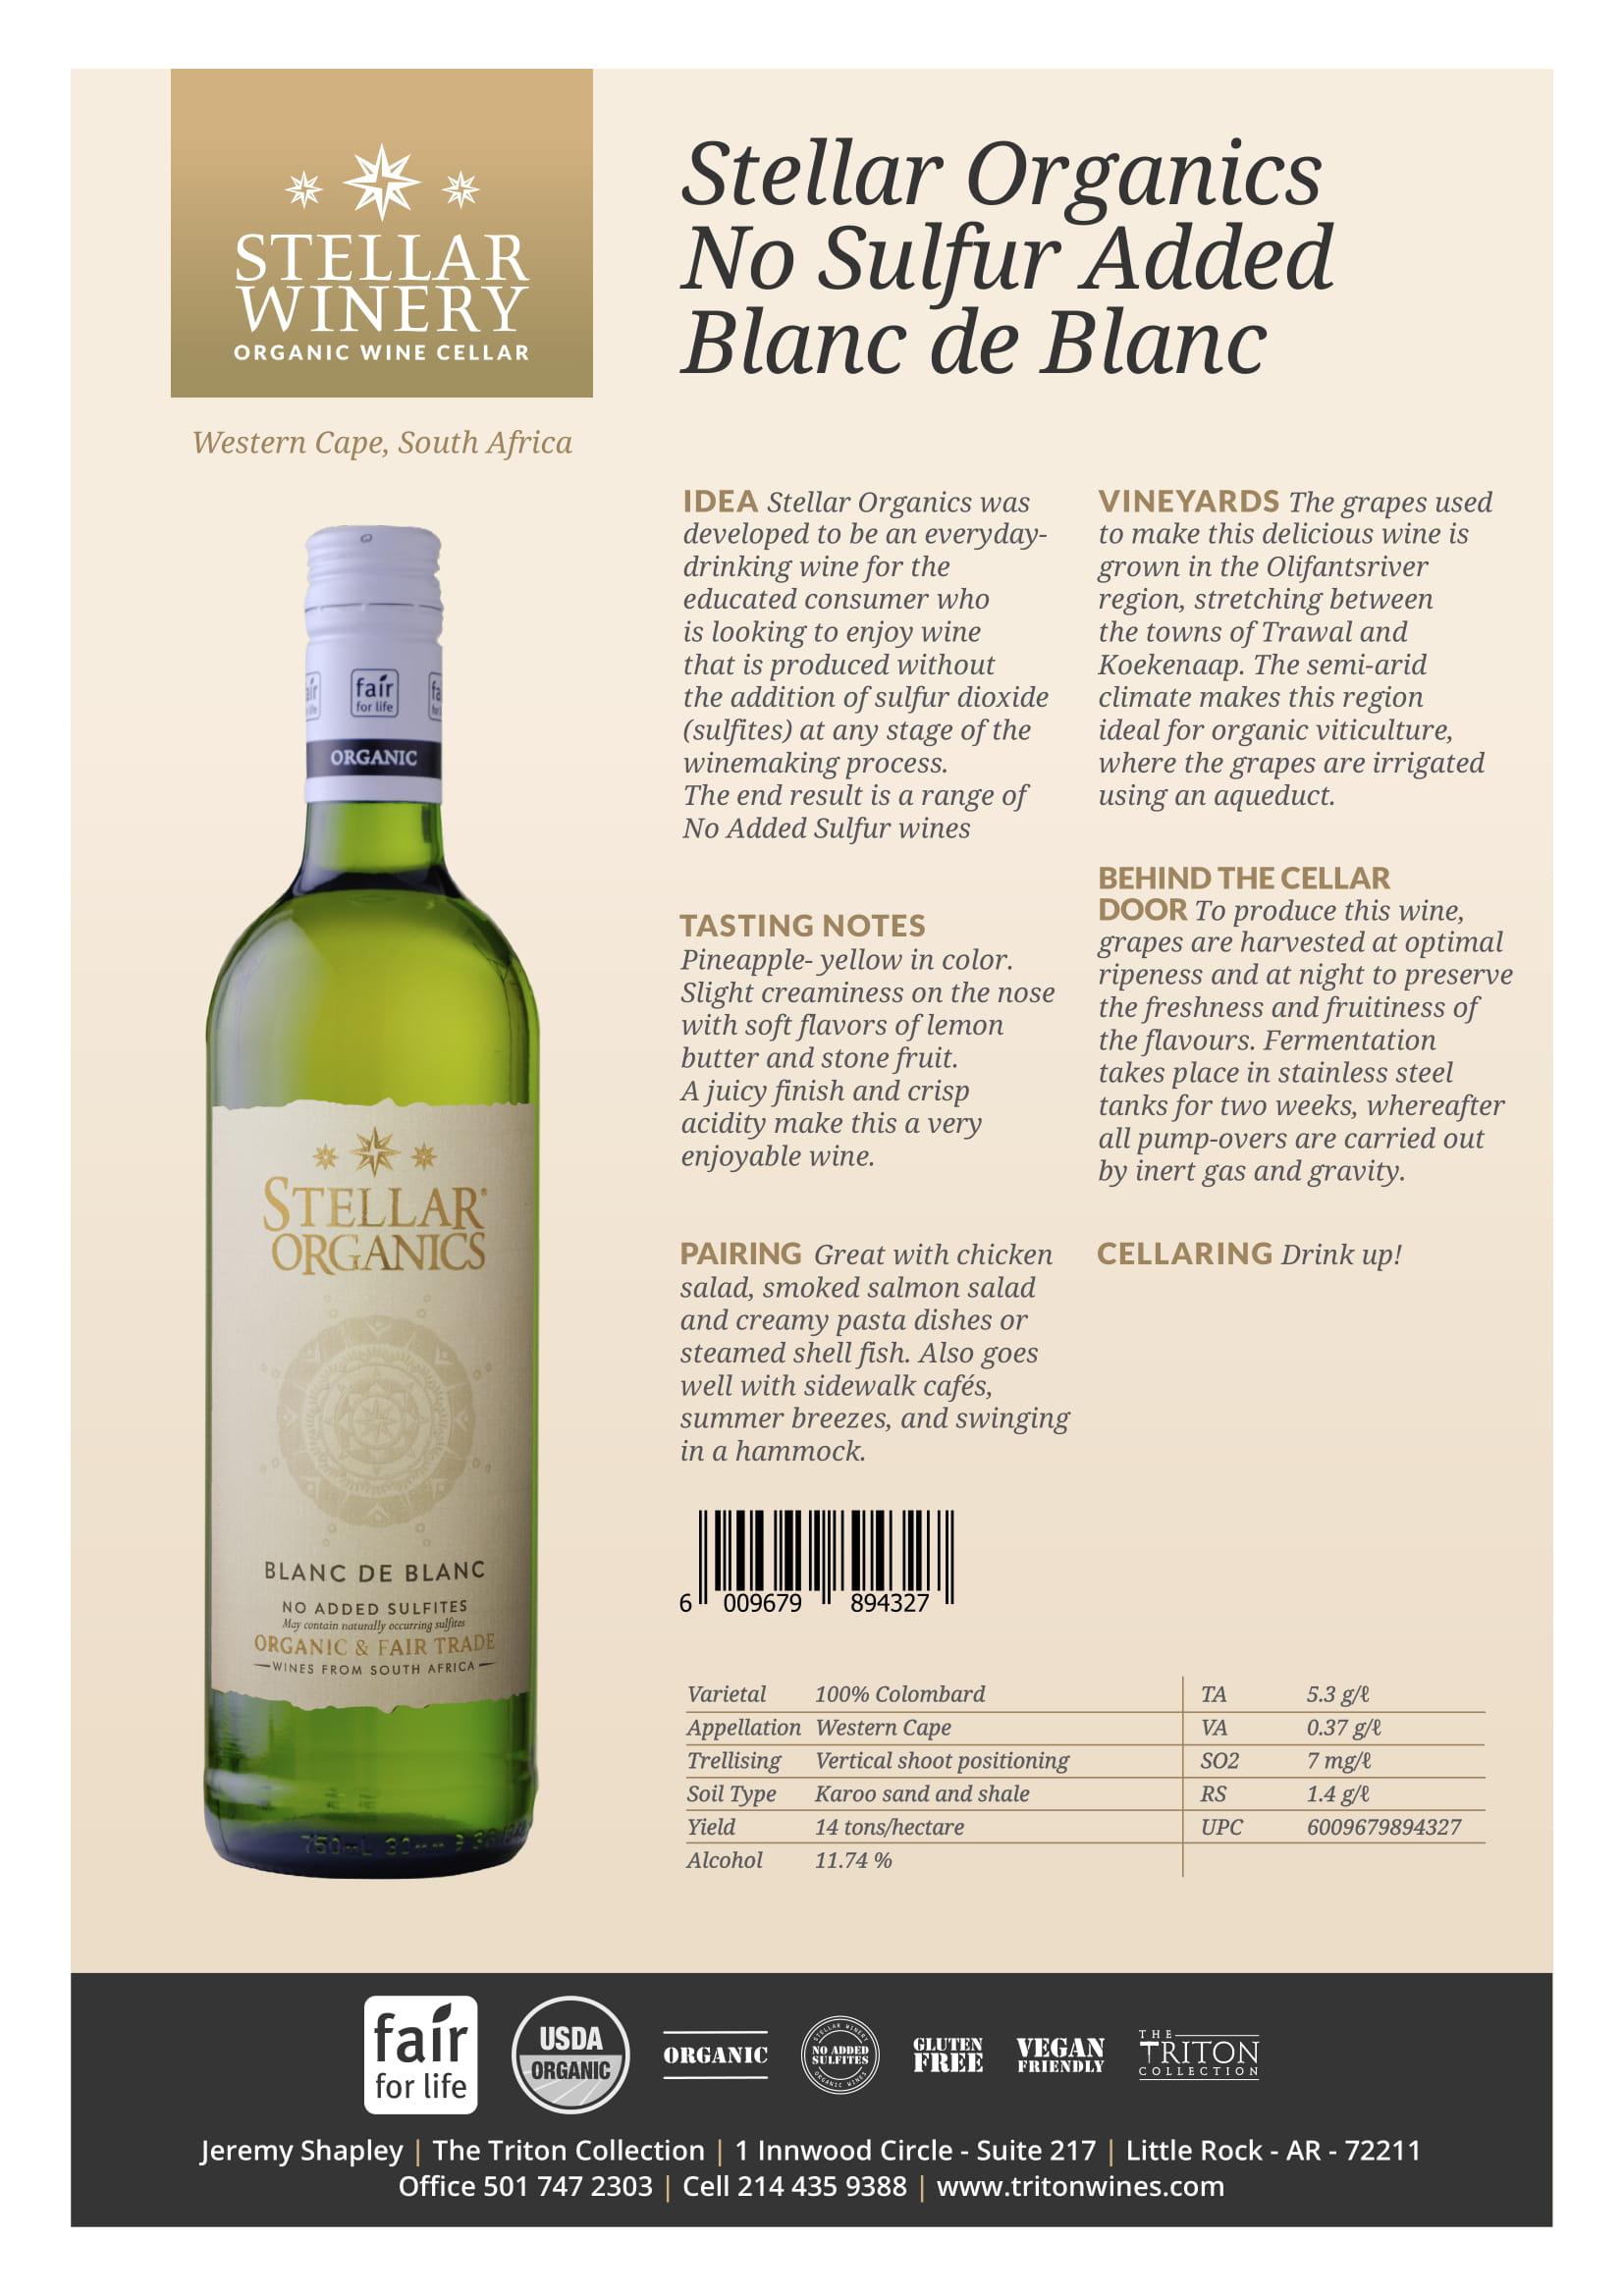 Stellar Organics Blanc be Blanc Tech Sheet